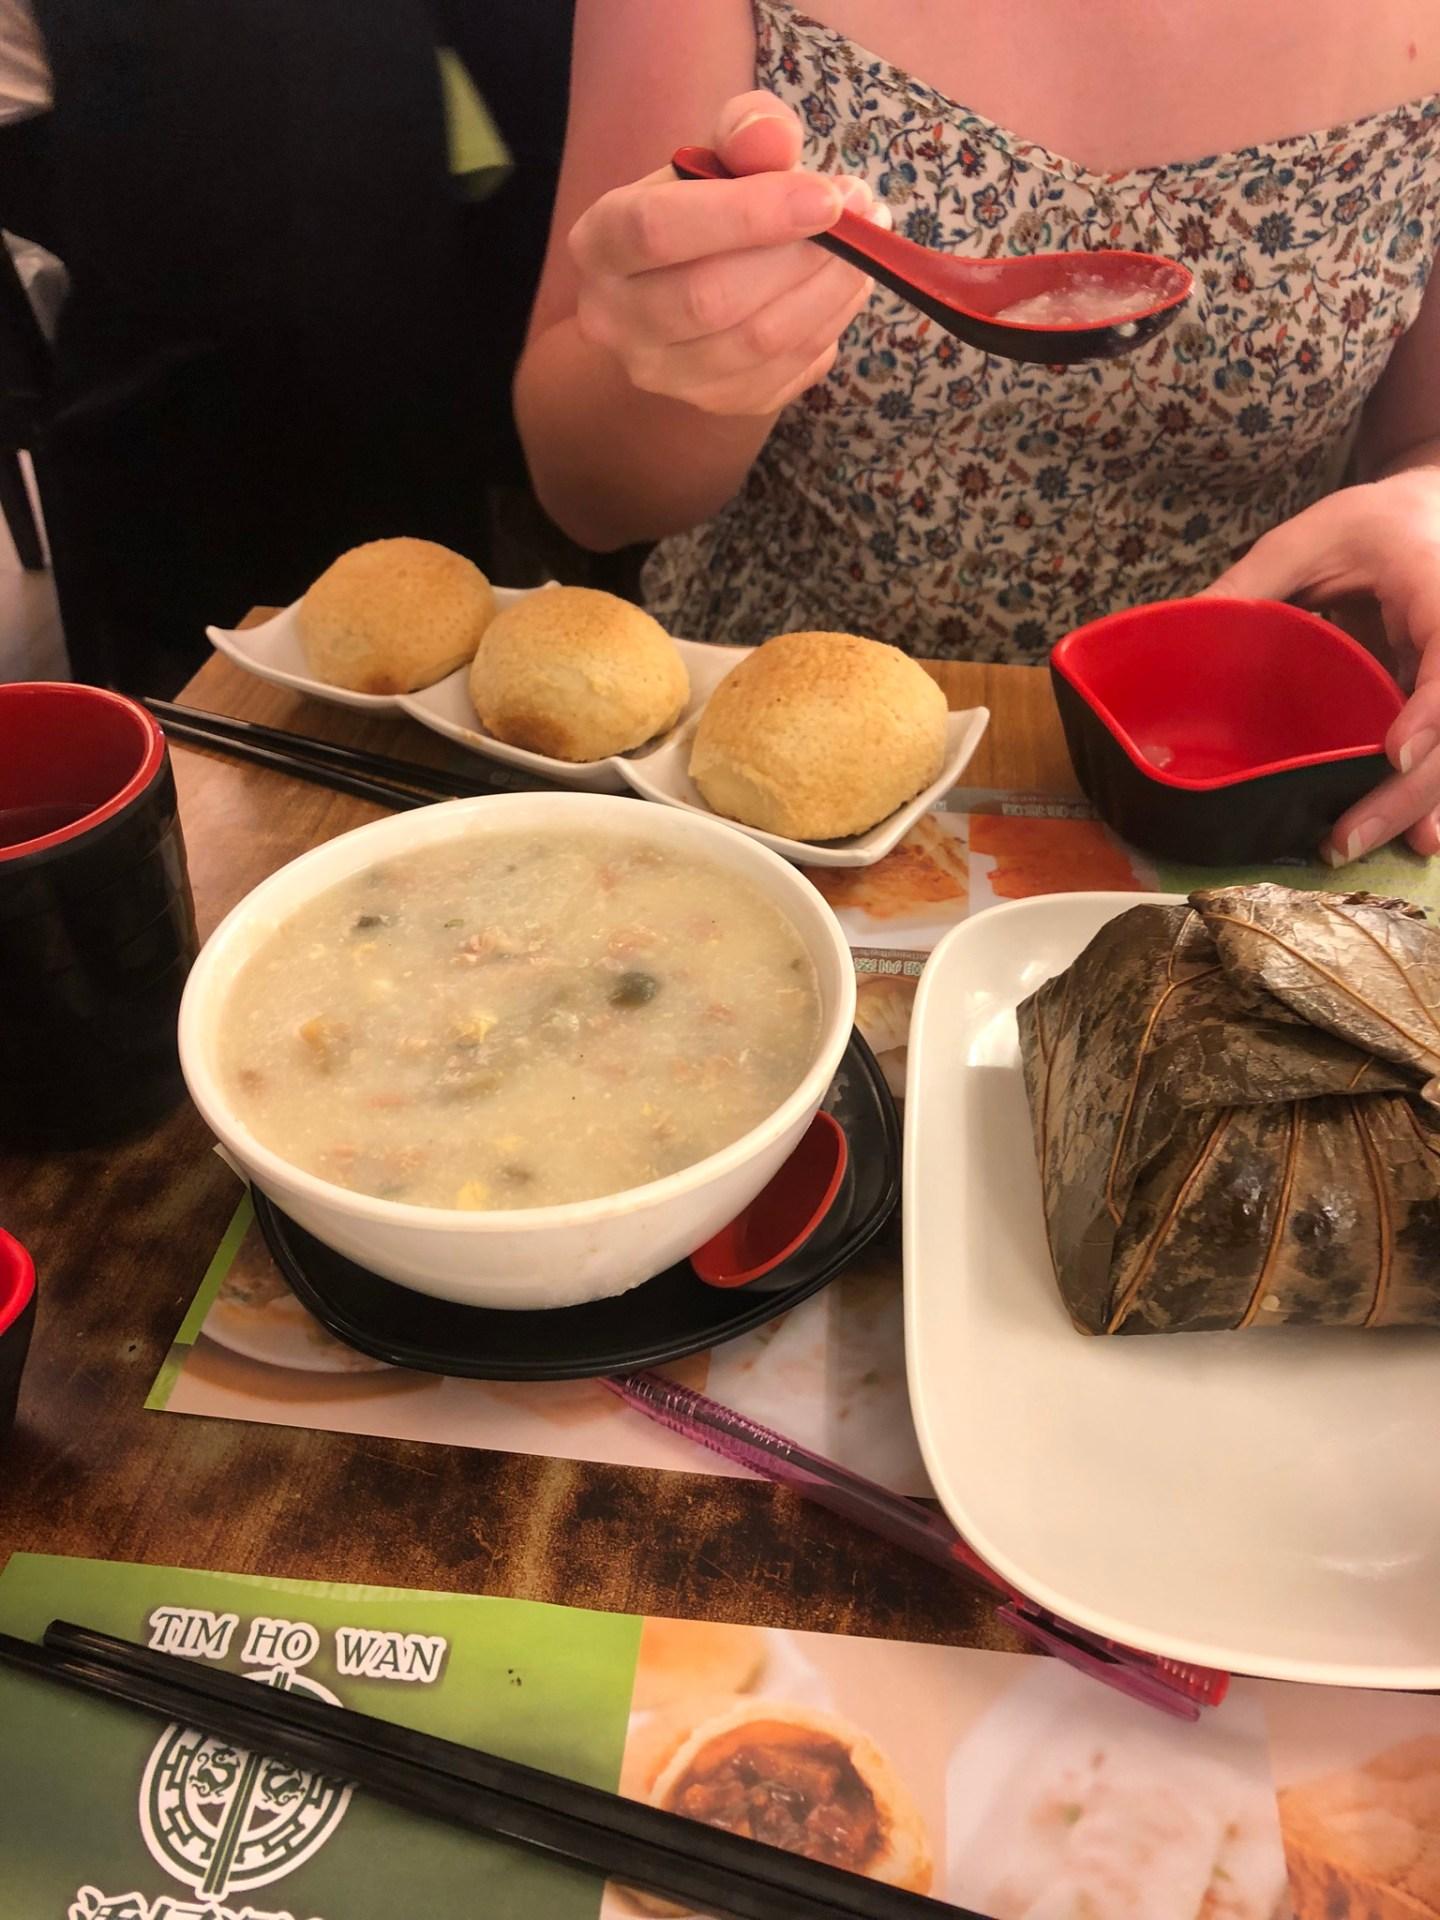 Food from Tim Ho Wan, Sham Shui Po